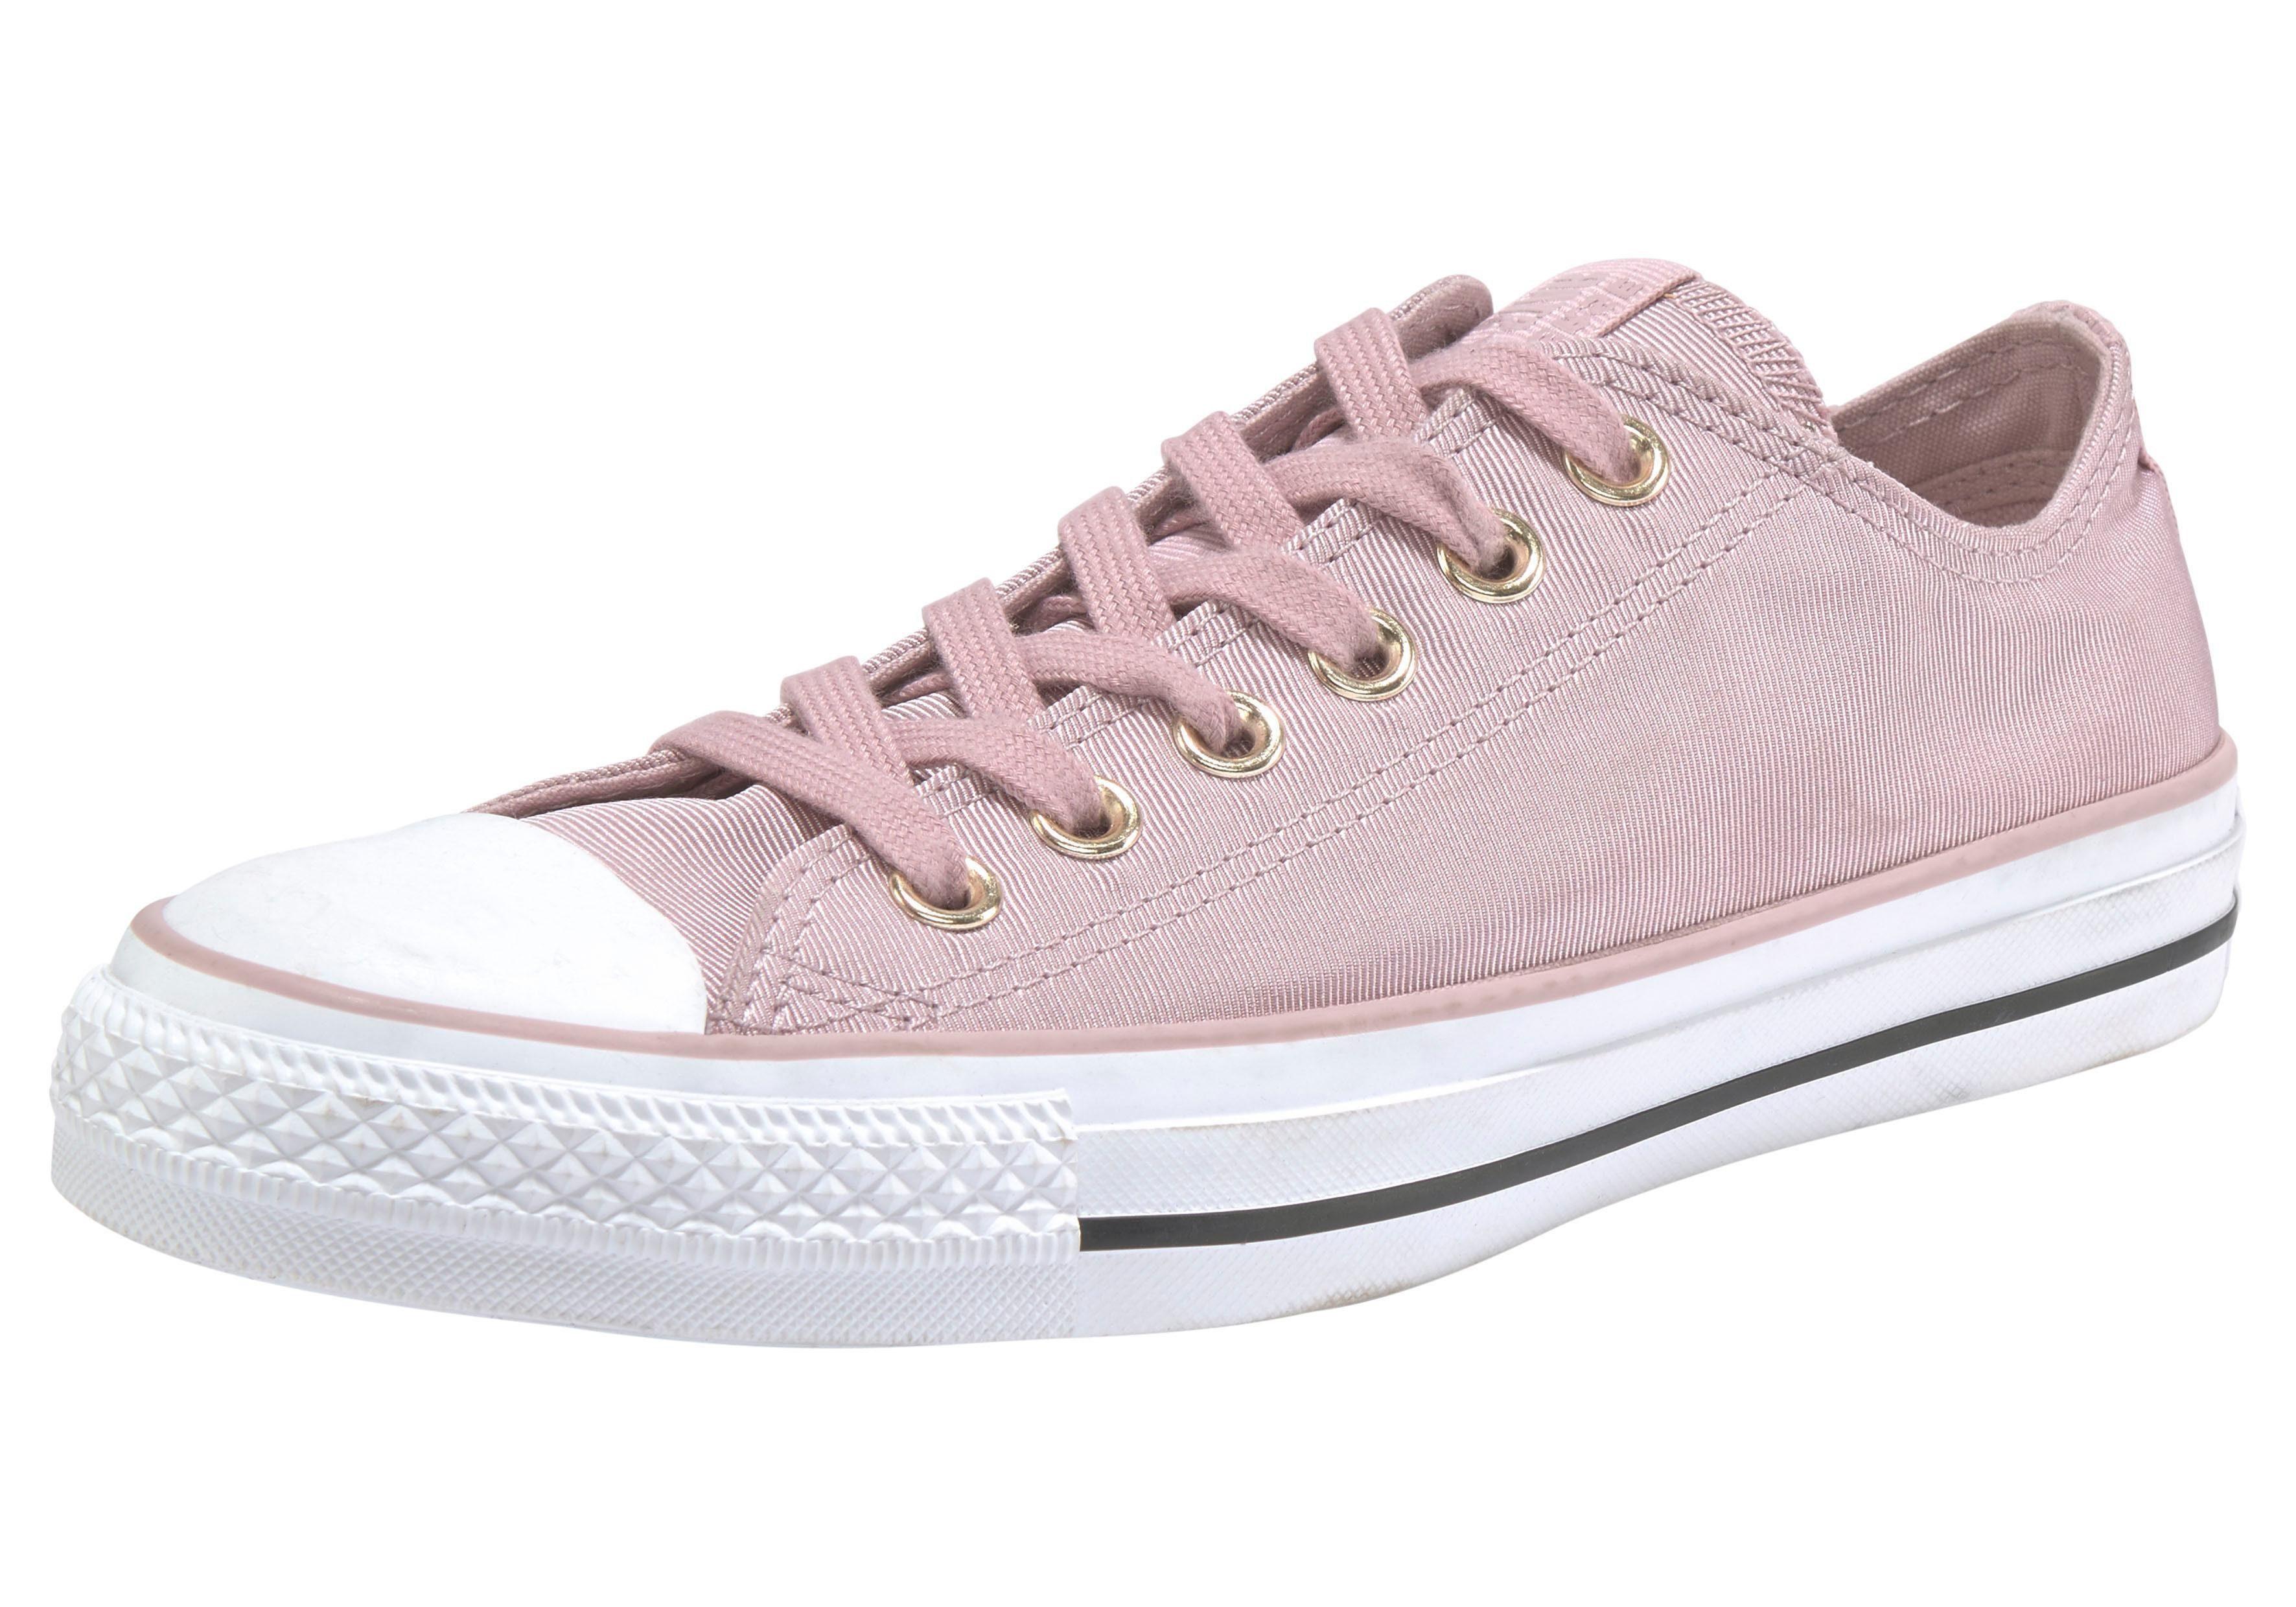 Converse »Chuck Taylor All Star Ox Boardwalk Ripstop« Sneaker online kaufen | OTTO